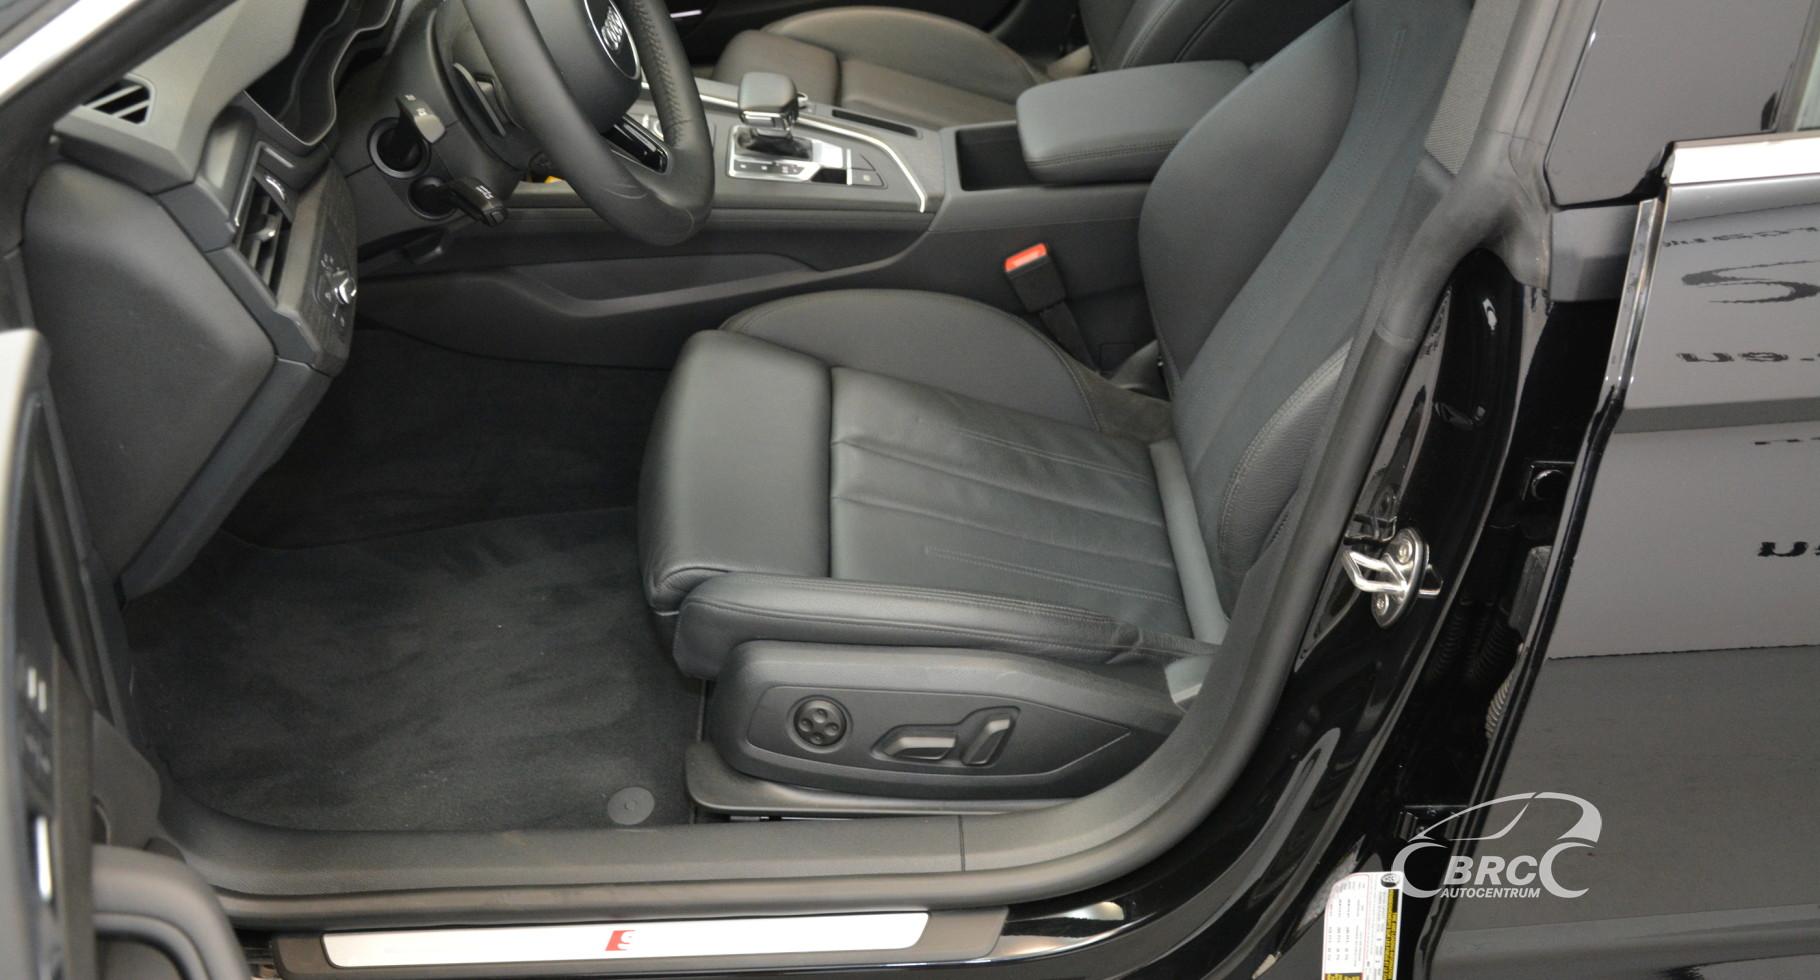 Audi A5 2.0 TFSI Quattro S-line Automatas